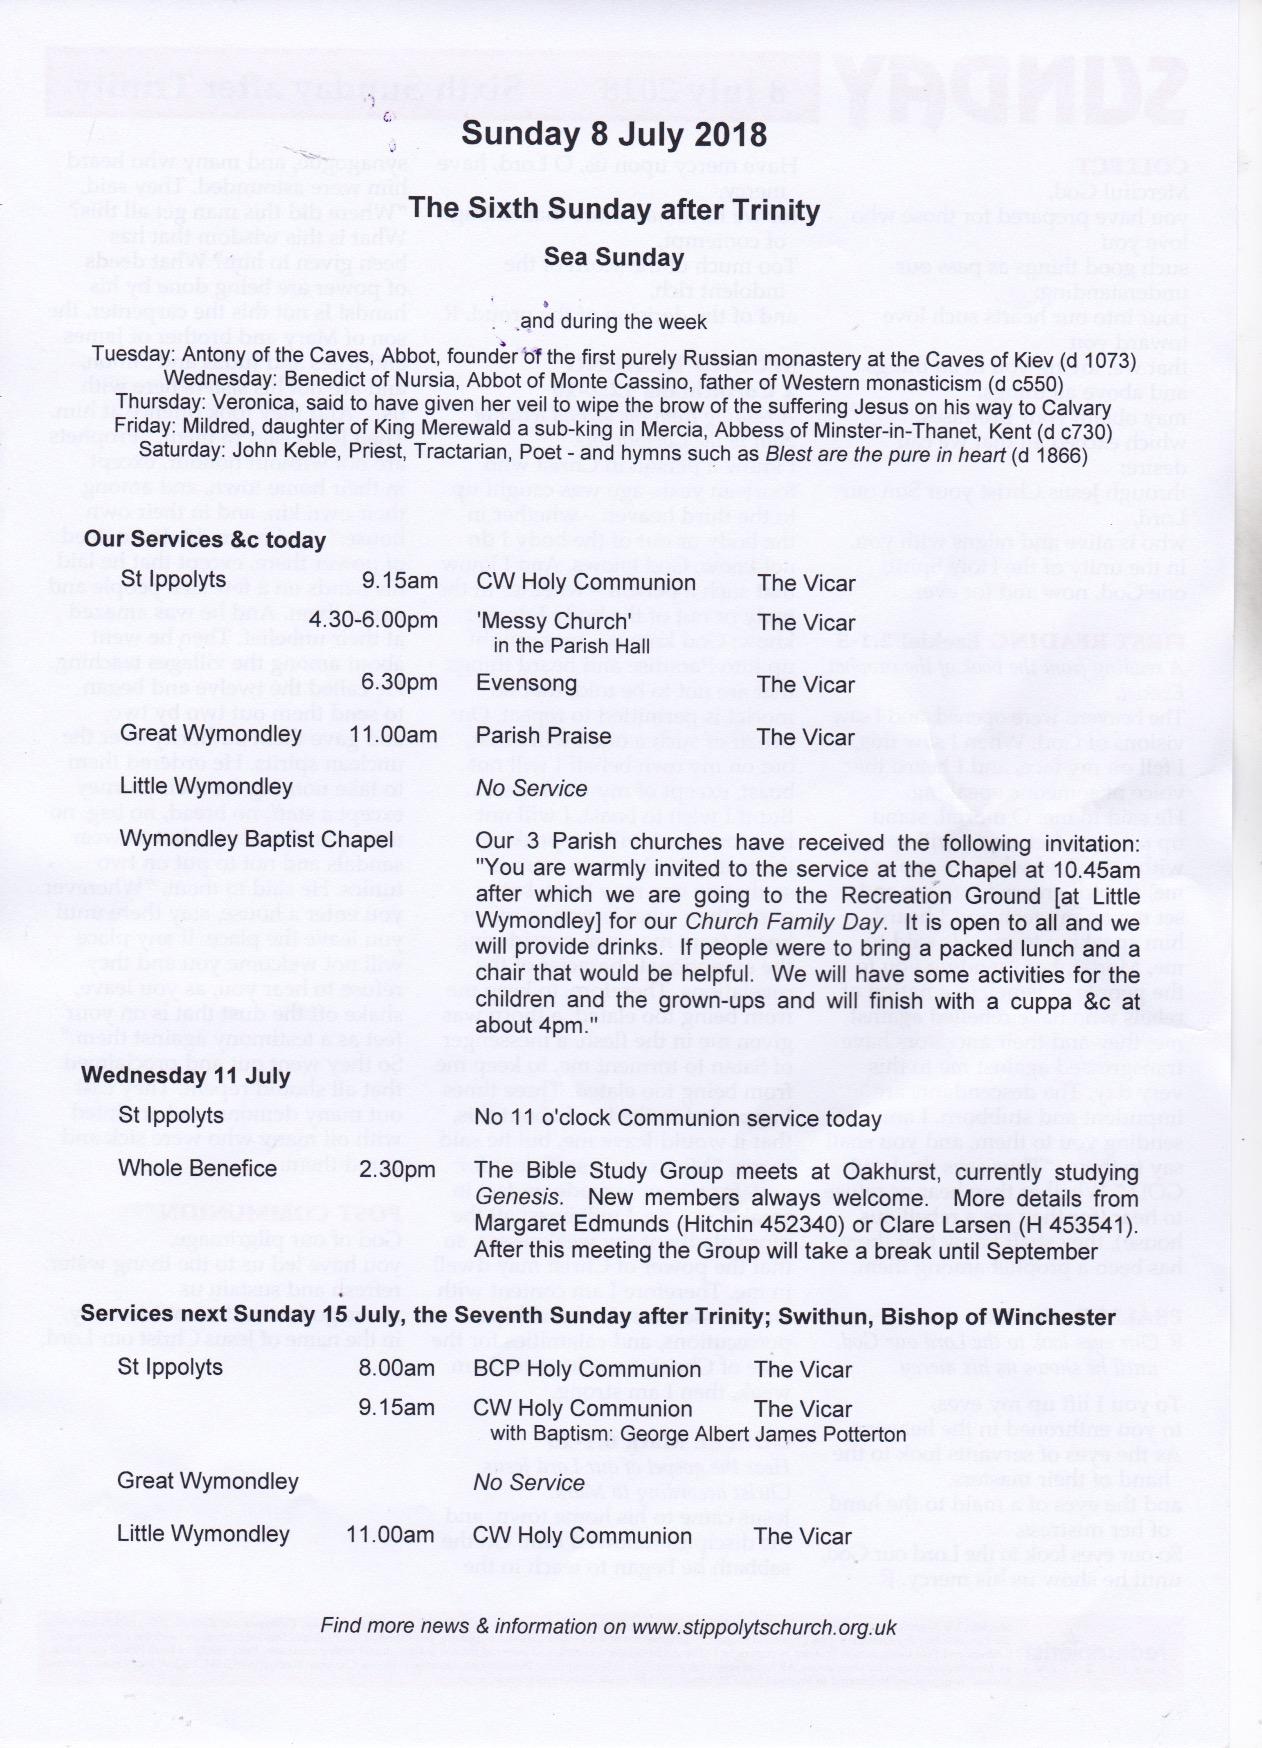 Weekly Pew Sheet, the Sixth Sunday after Trinity, Sea Sunday